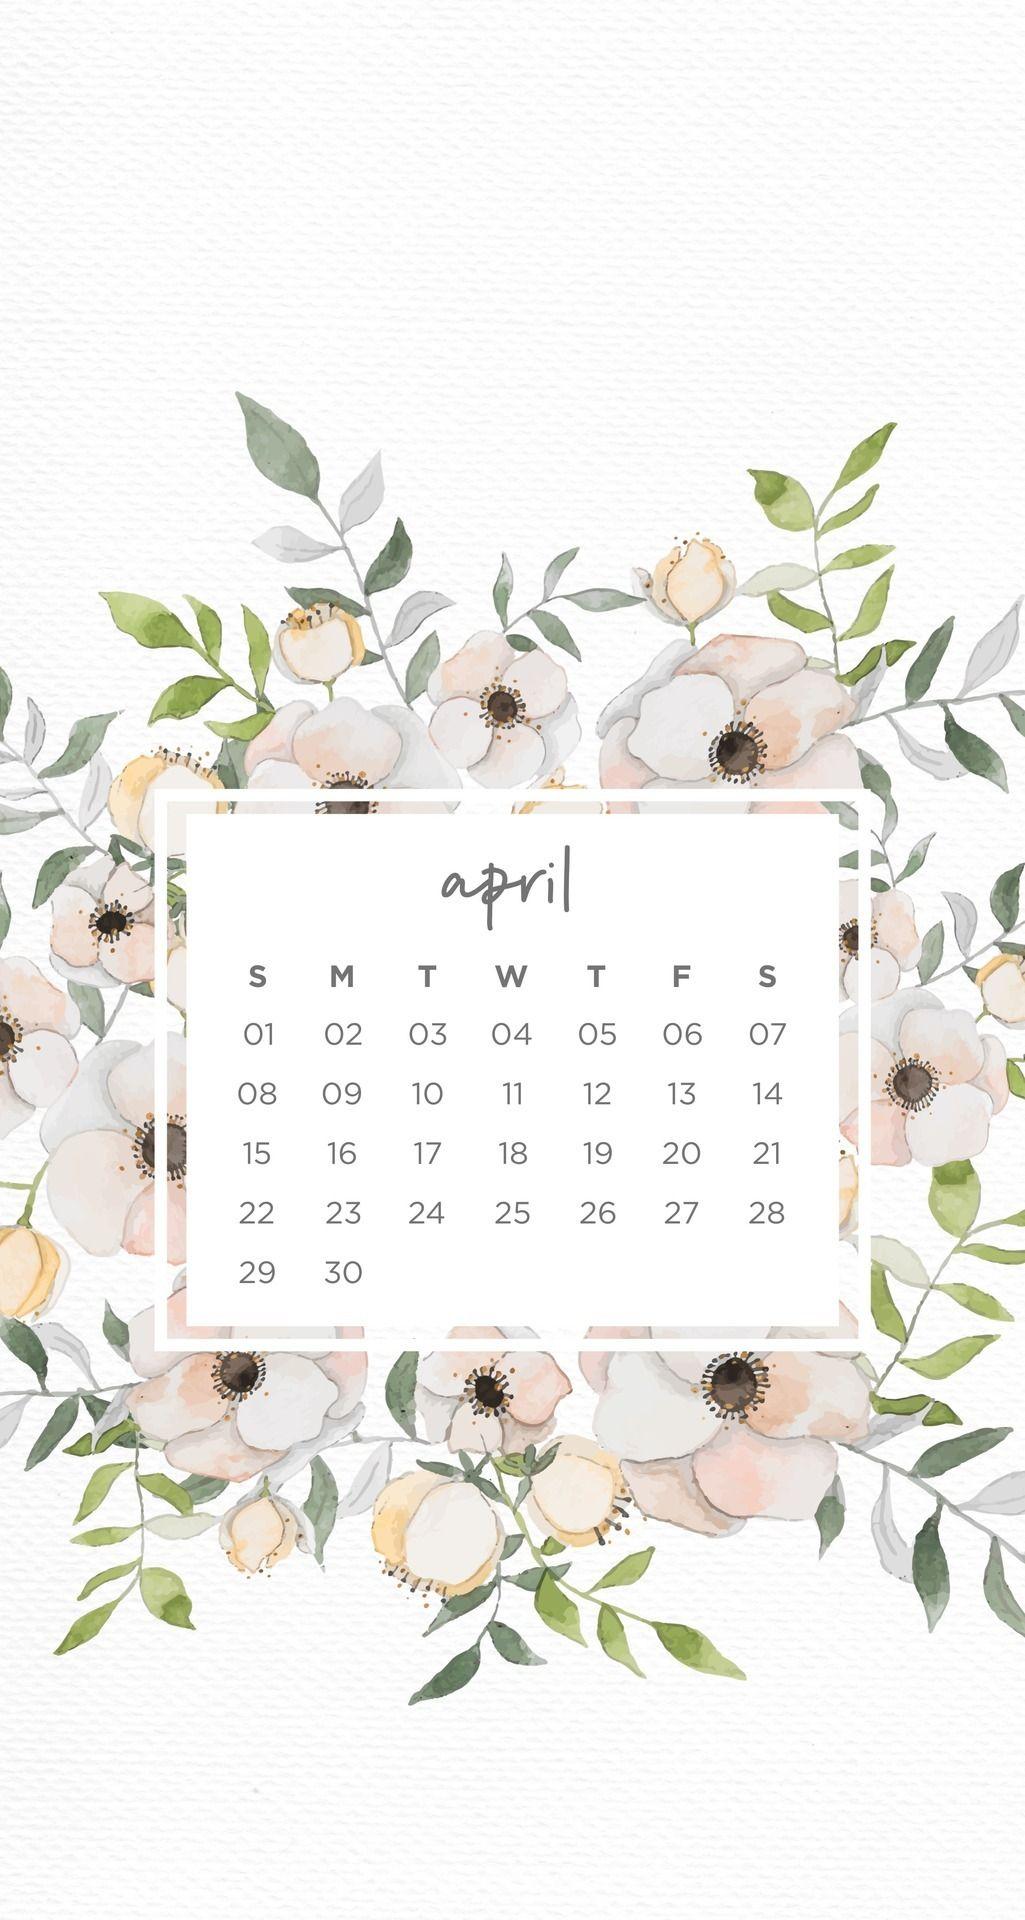 April 2018 Spring Wallpaper